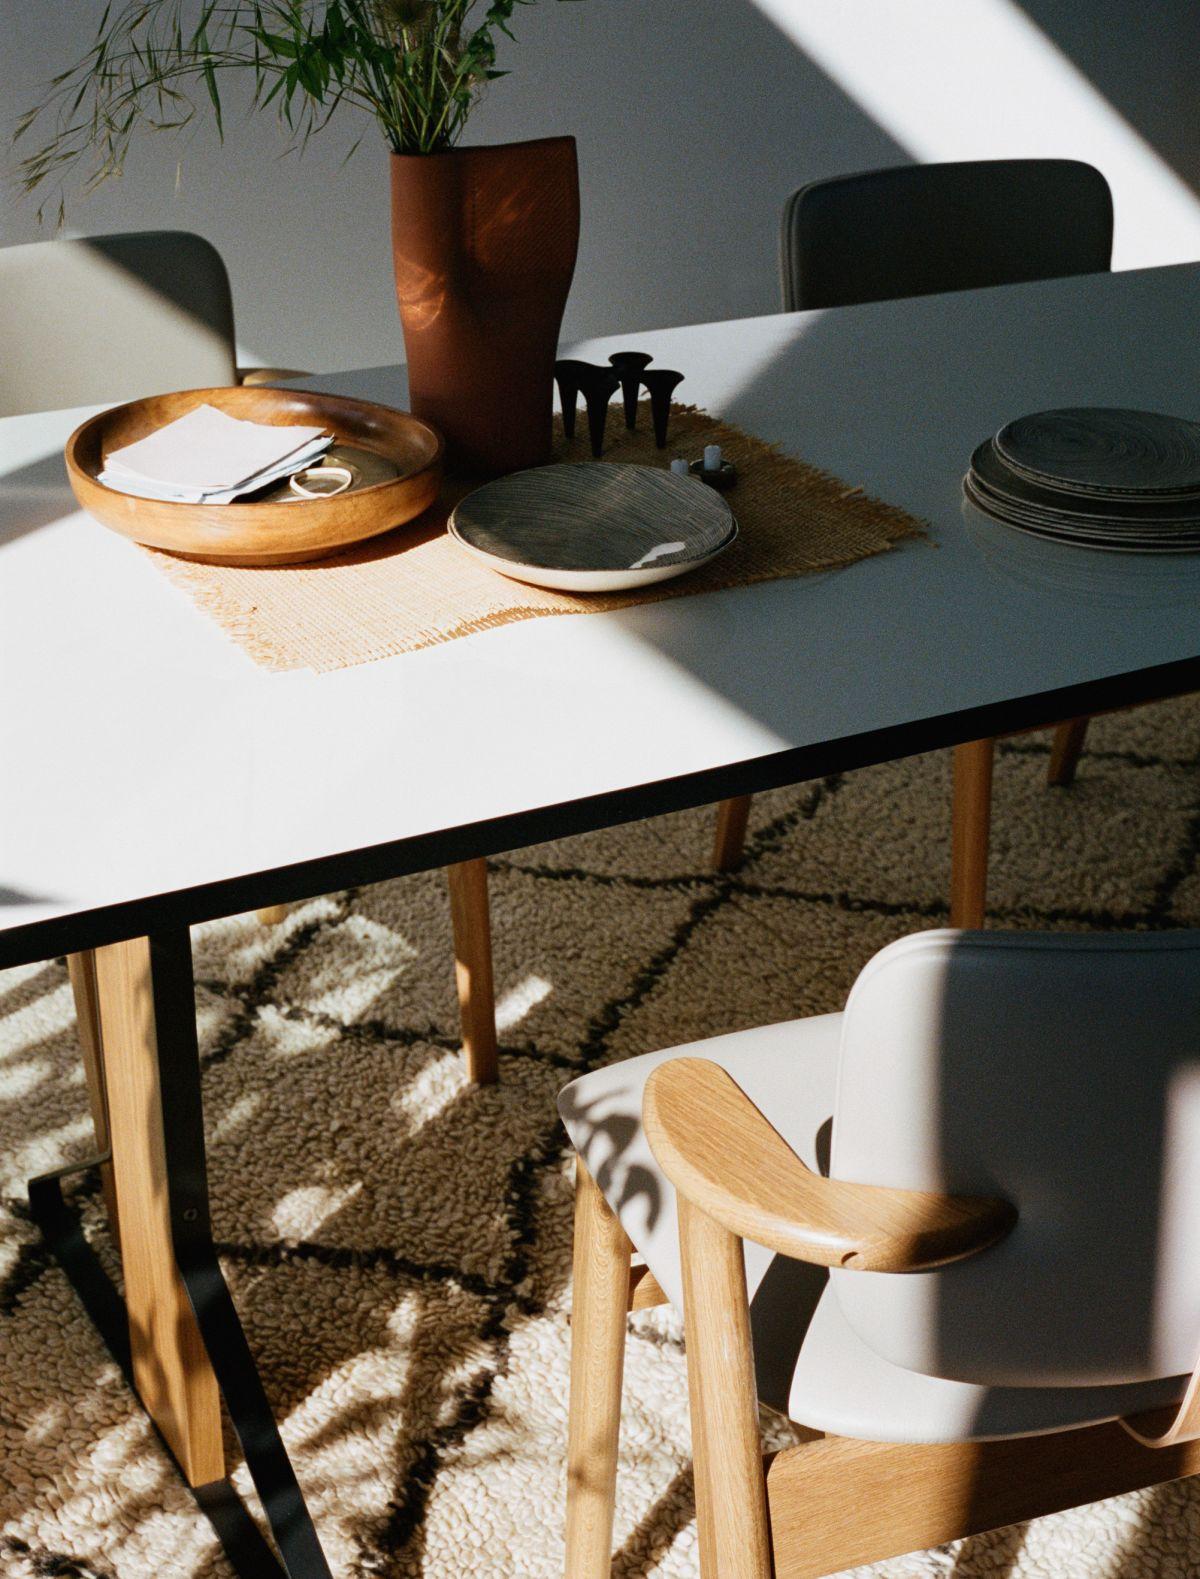 Kaari_Table_rectangular_REB002_Domus_Chair_leather_upholstered_2